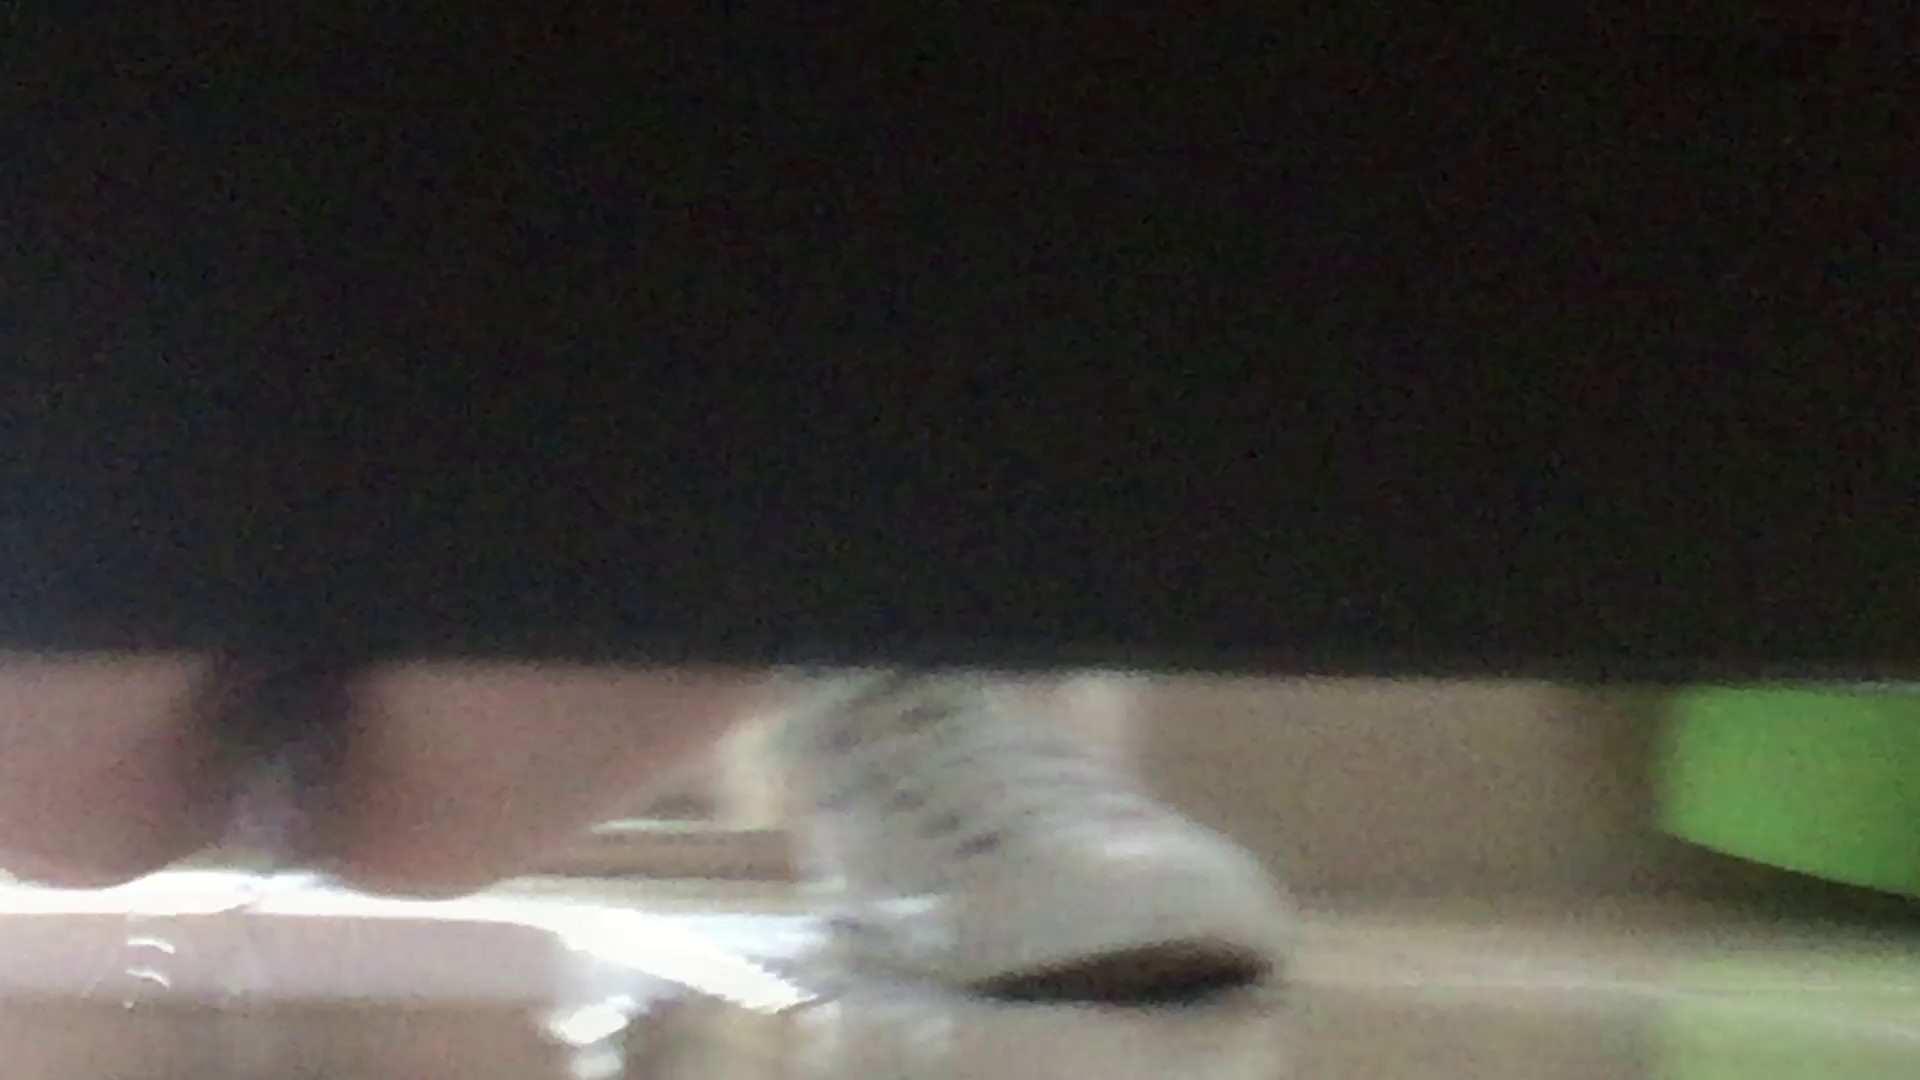 JD盗撮 美女の洗面所の秘密 Vol.70 ギャル達 オメコ無修正動画無料 110枚 57